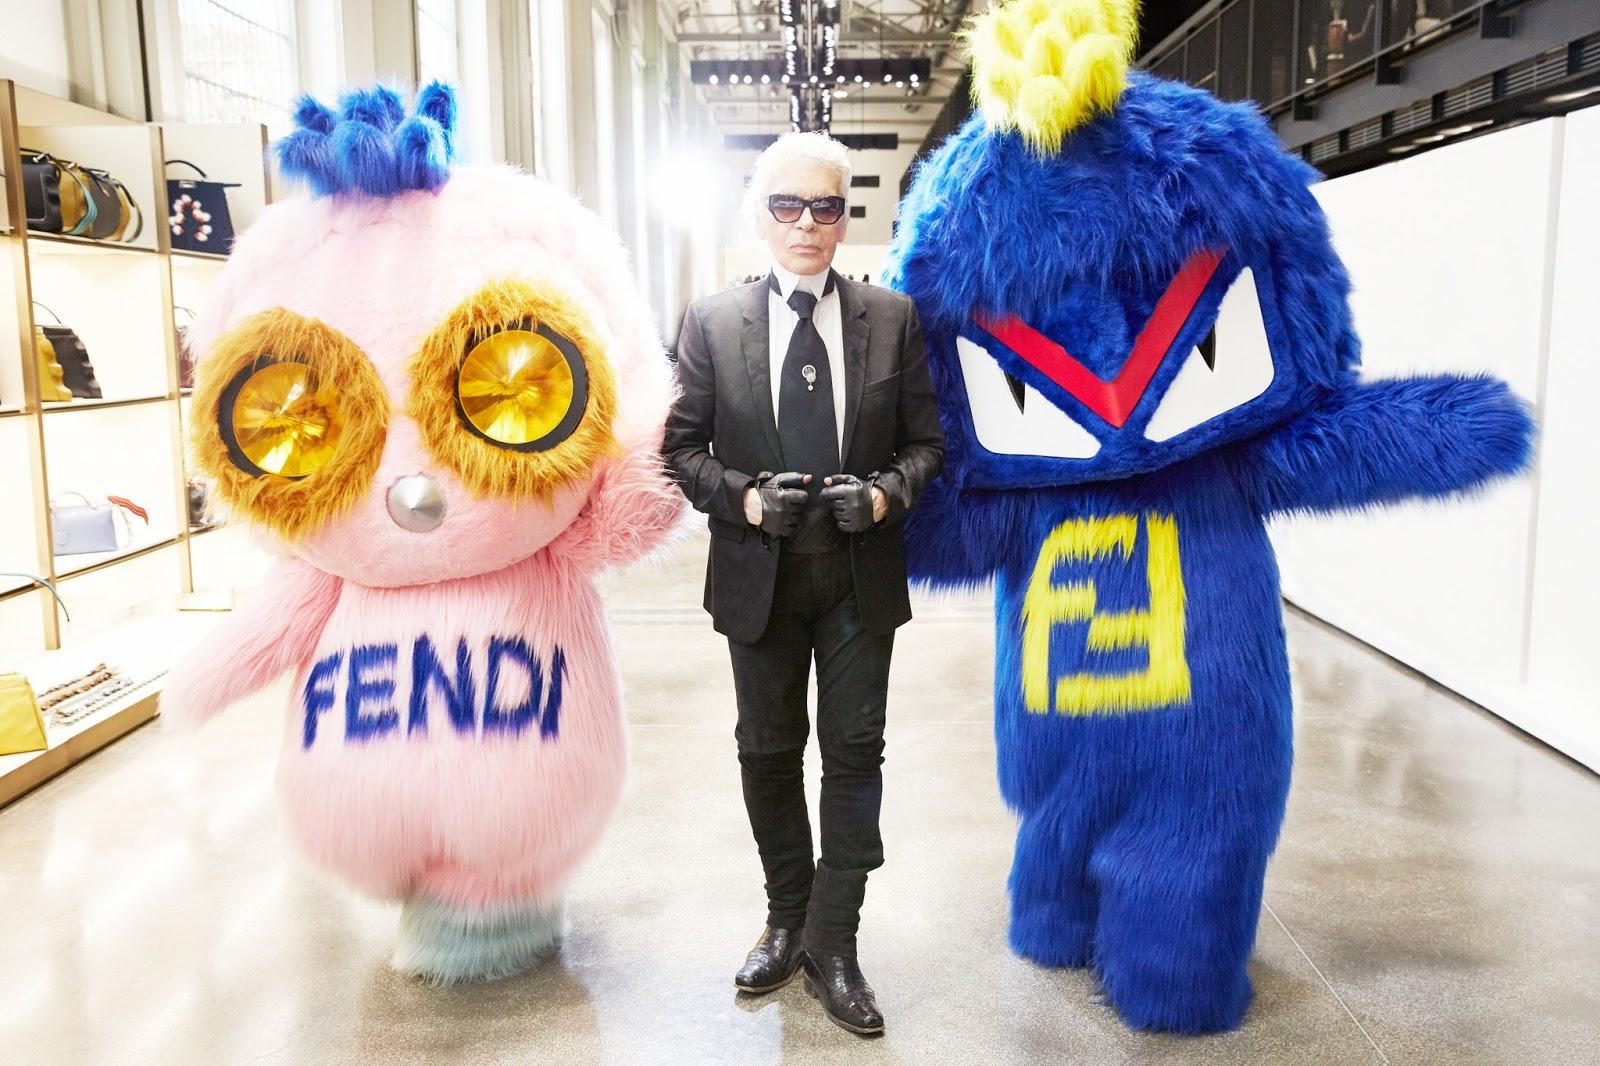 fendirumi-posing-with-Karl-Lagerfeld-fendi-FW16-show-MFW, fendi-dendirumi, fendirumi, dudessinauxpodiums, du-dessin-aux-podiums